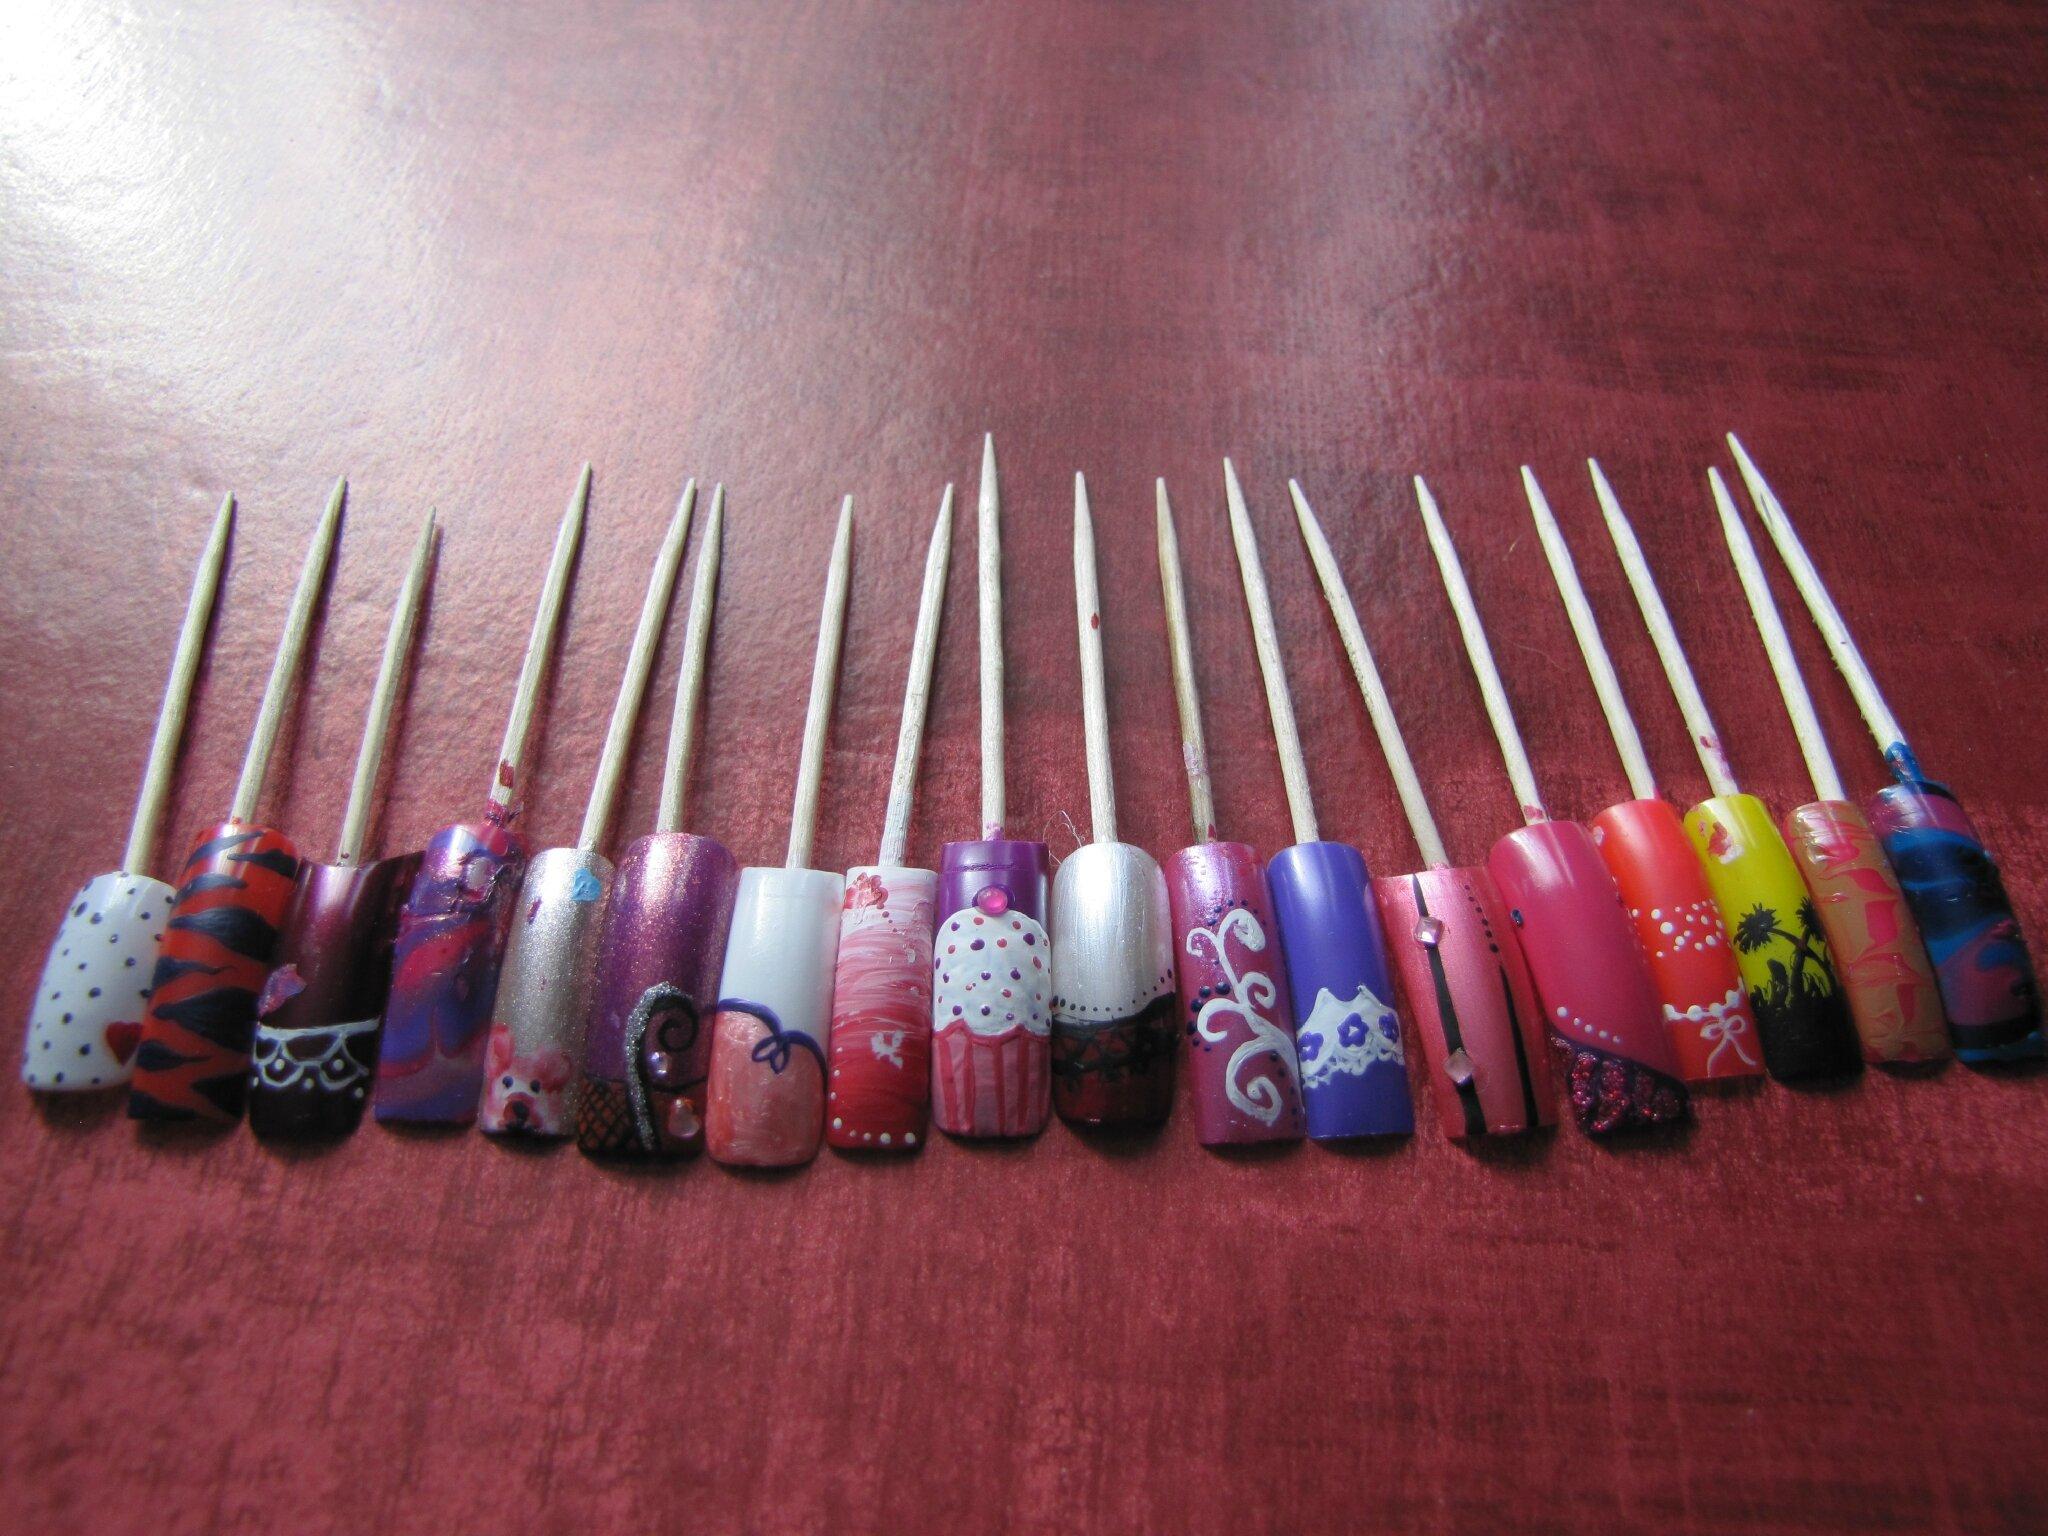 100 Modele Ongle Nail Art Vp Nails Juillet 2013